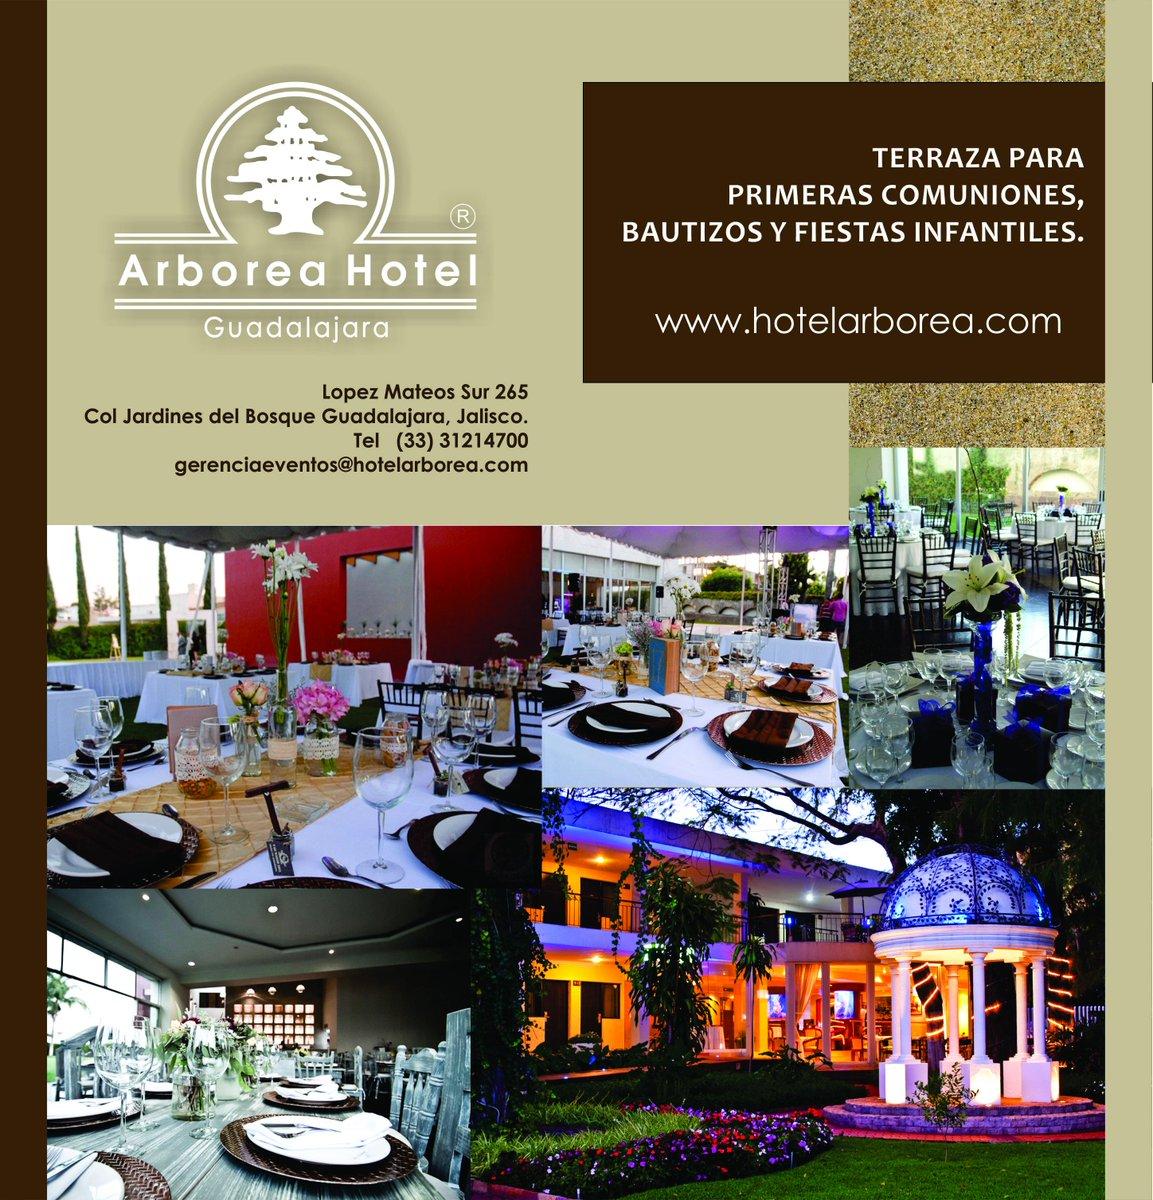 Hotel Arborea Gdl Hotelarboreagdl Twitter